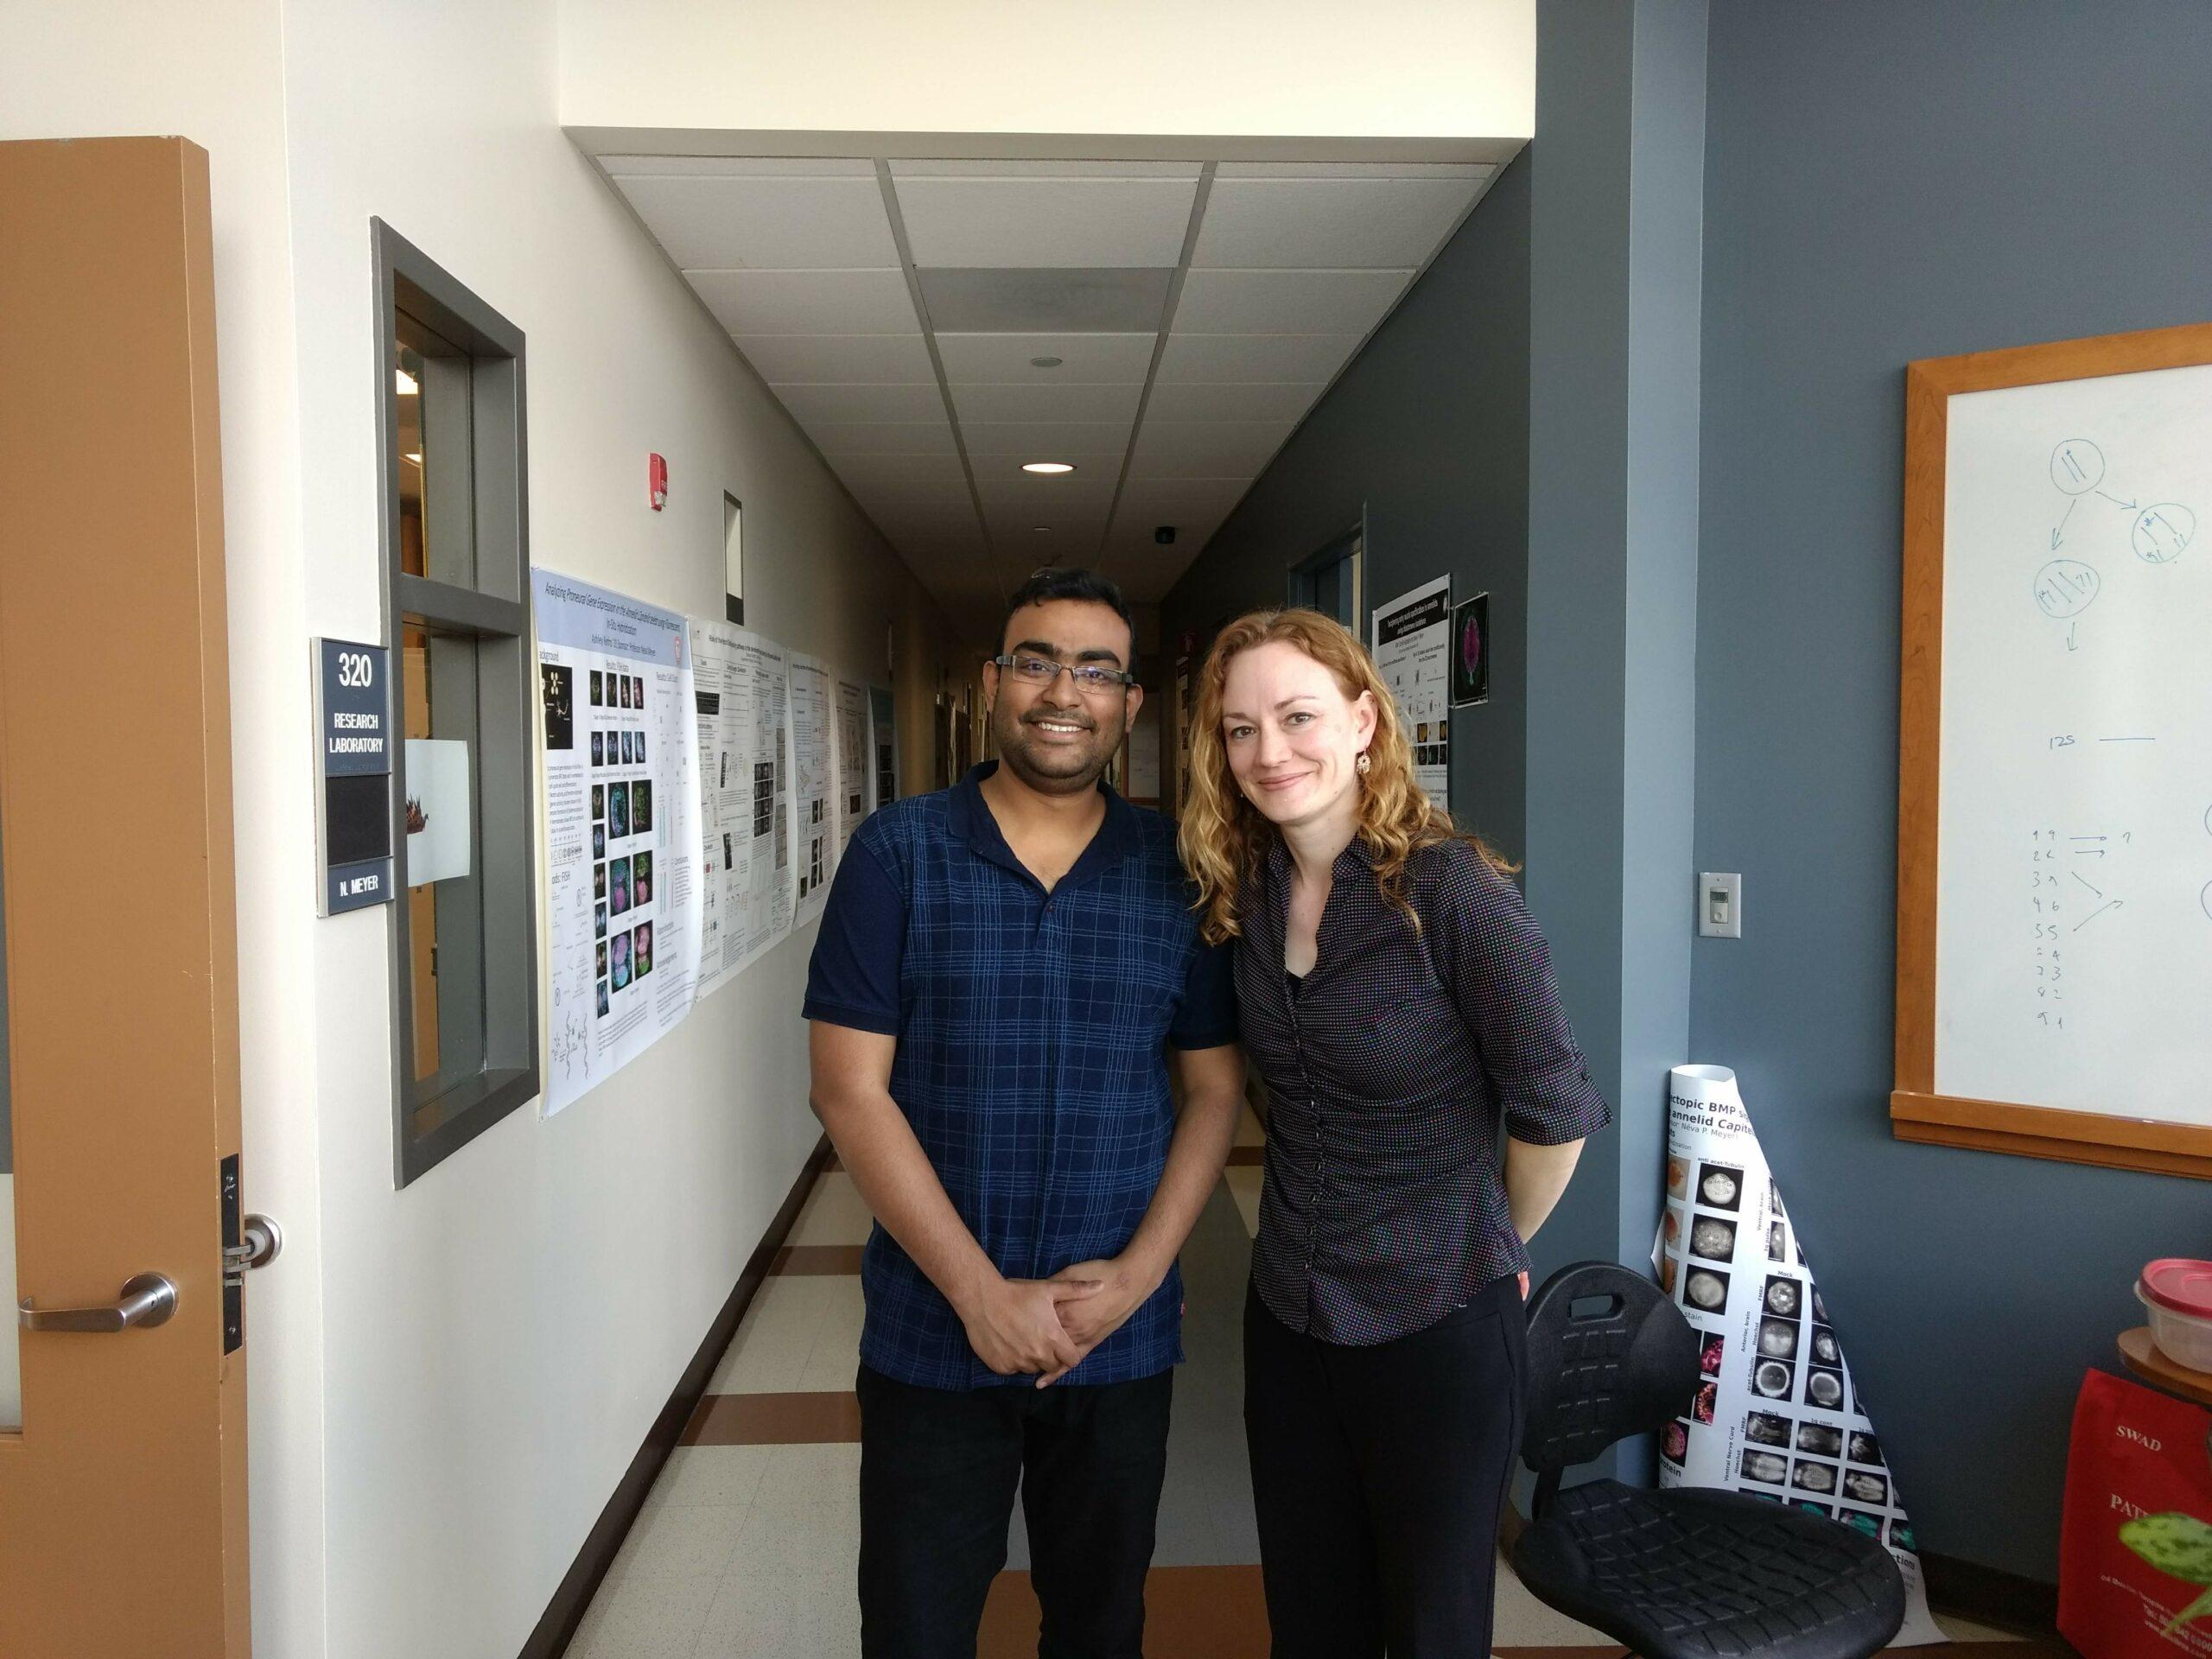 Dr. Abhinav Sur and Dr. Meyer